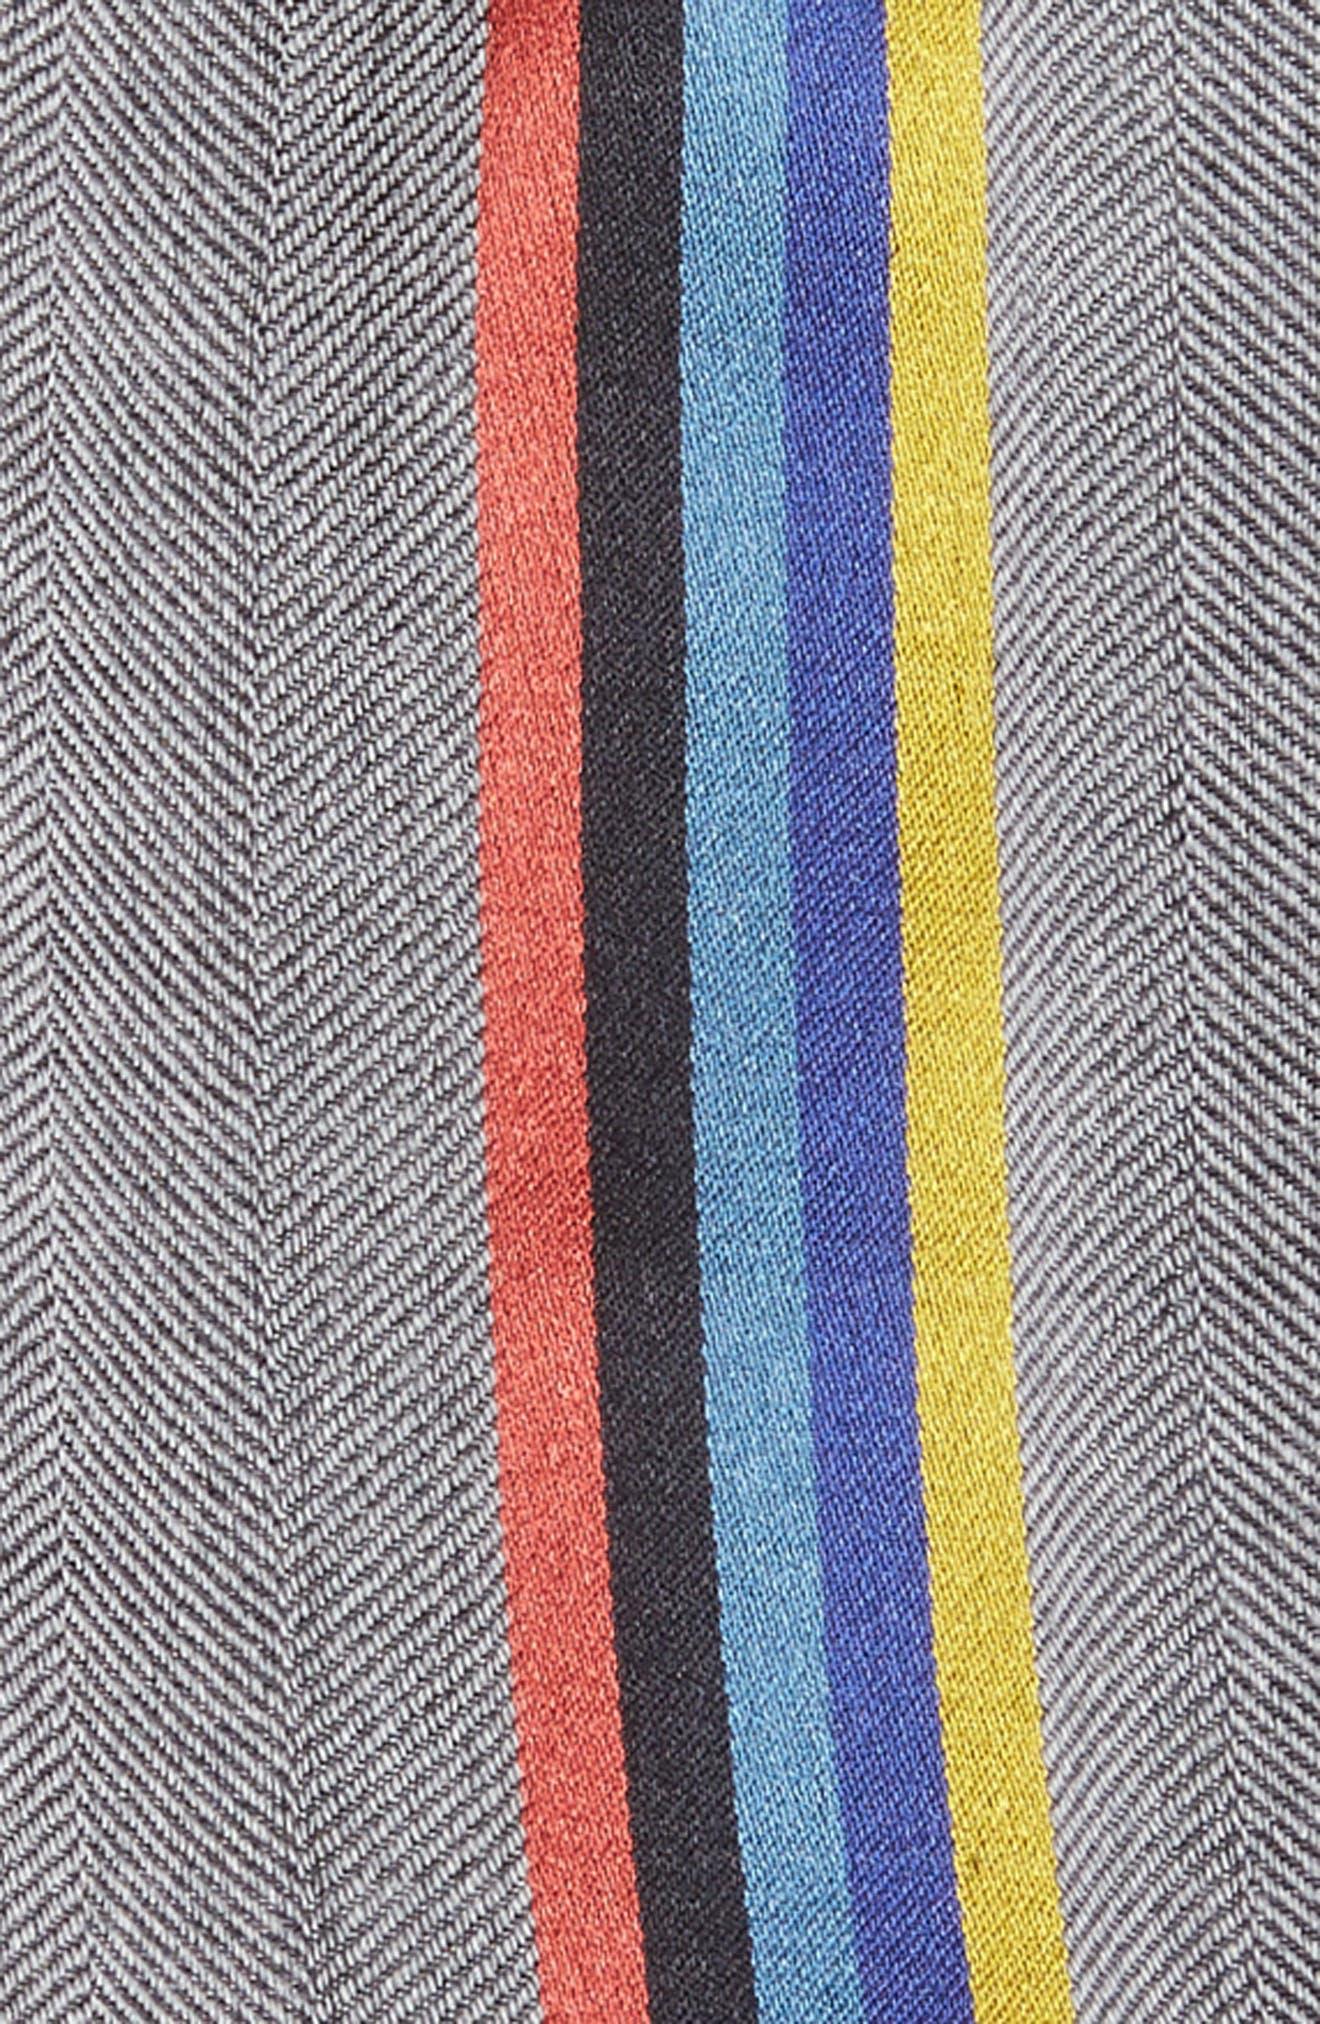 Alternate Image 3  - Paul Smith Central Stripe Wool & Silk Scarf